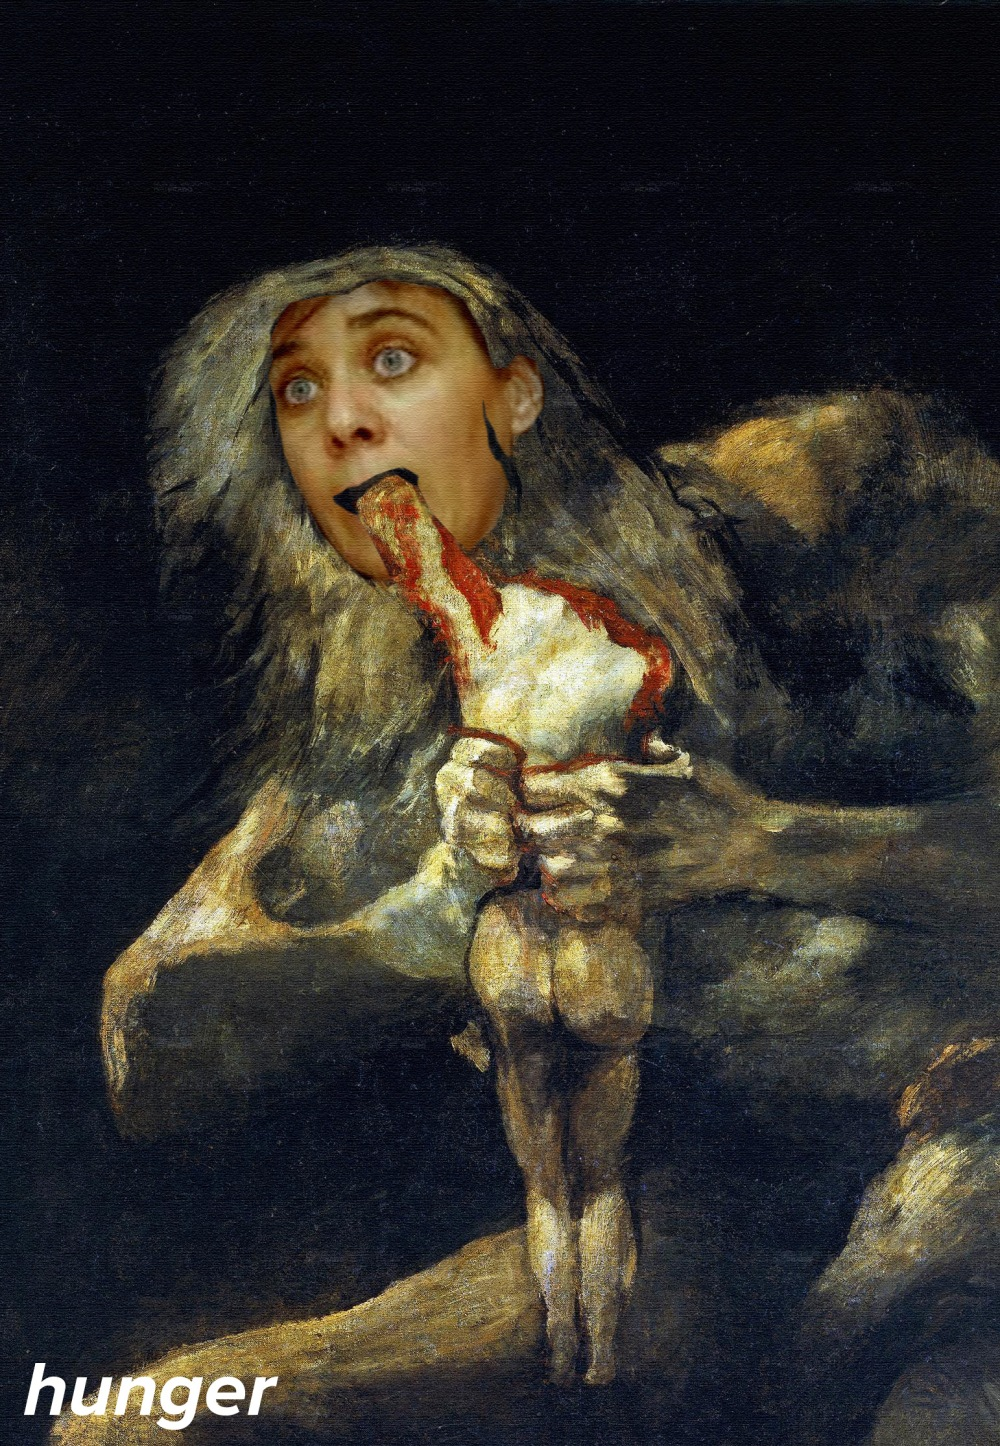 catarina hunger.jpg